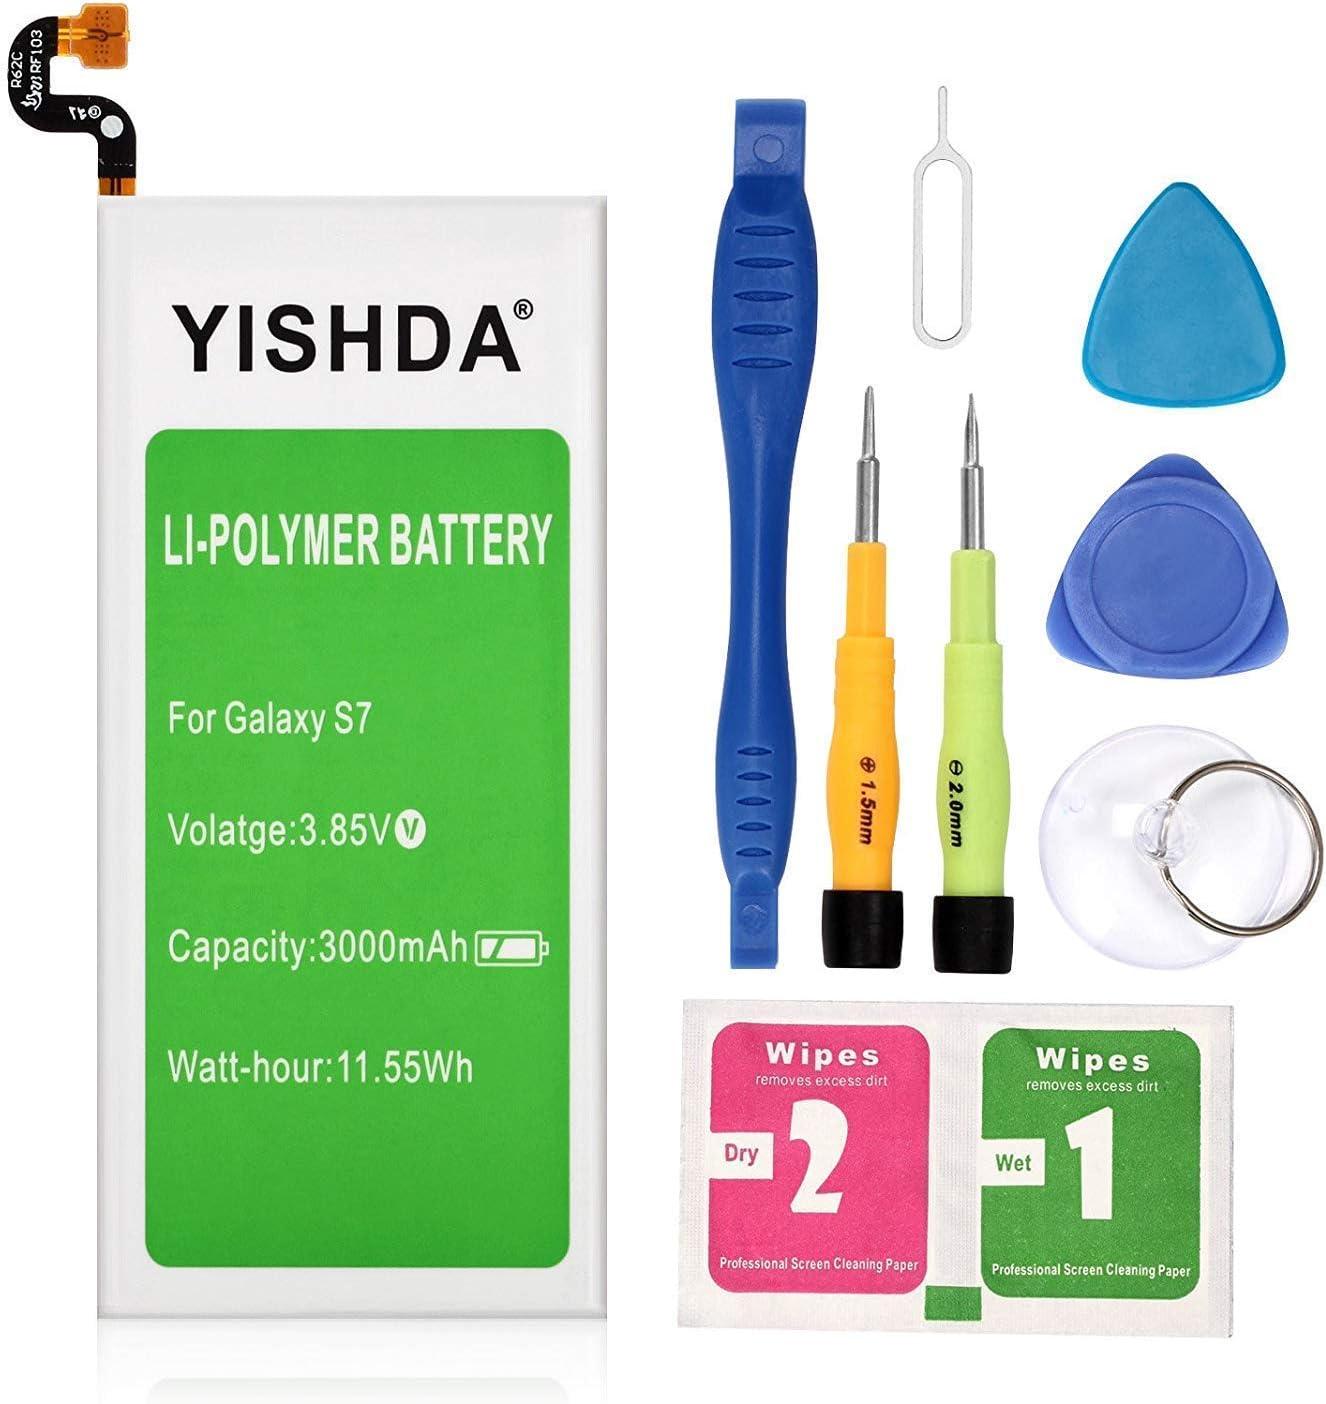 Galaxy S7 Battery, YISHDA 3000mAh Replacement Samsung Galaxy S7 Battery SM-G930 EB-BG930ABE Compatible with G930V G930A G930T G930P G930F with Tools | Samsung Galaxy S7 Battery Kit [18 Month Warranty]